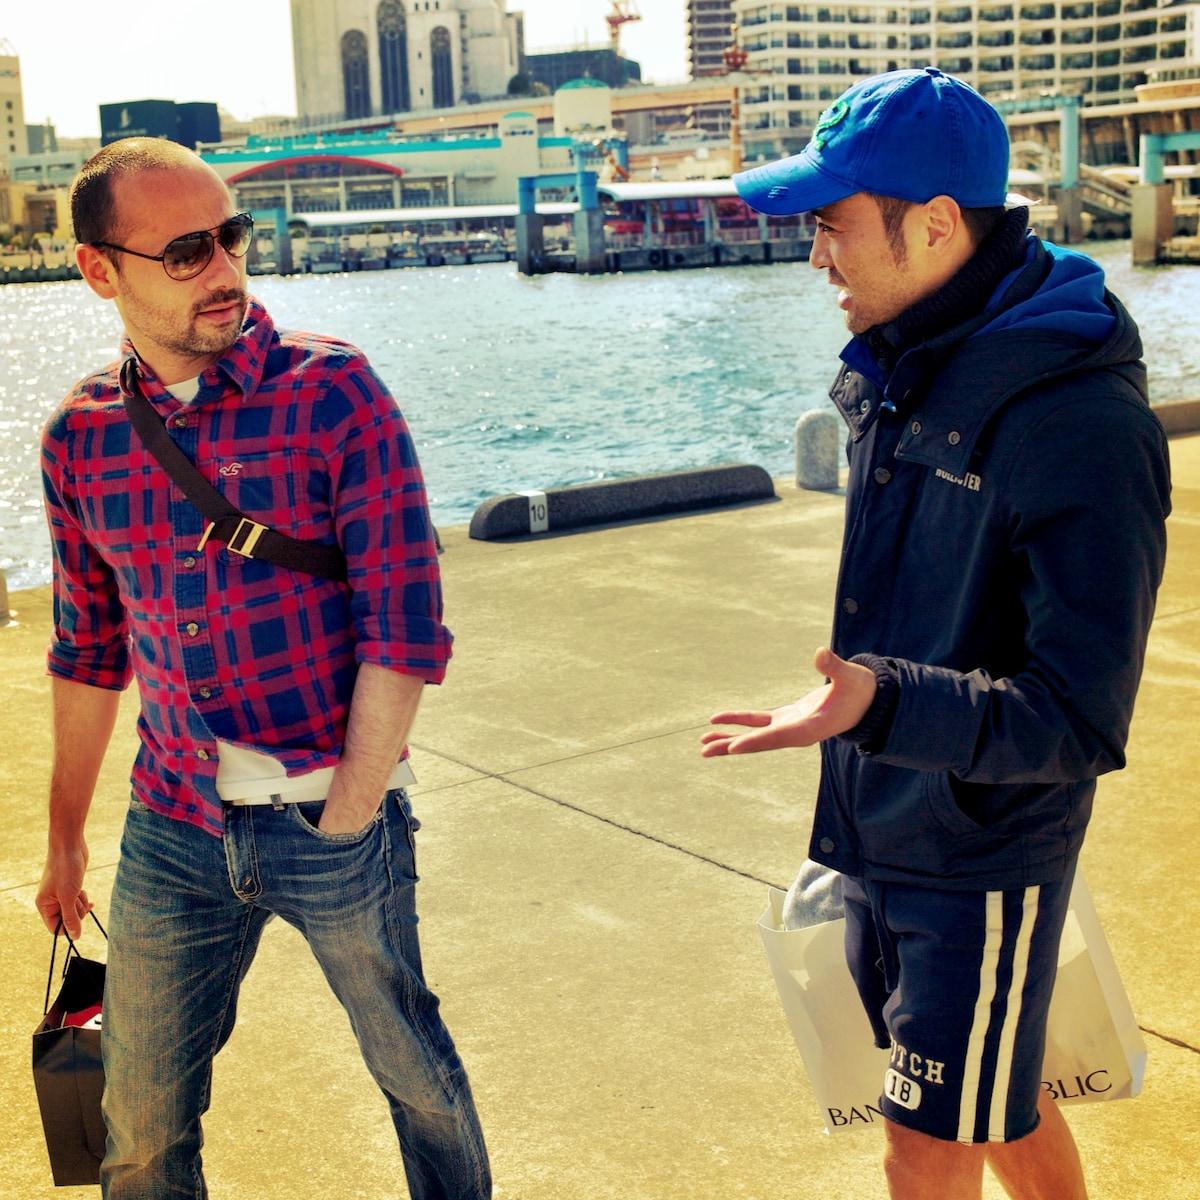 Ken & Nico from Minato